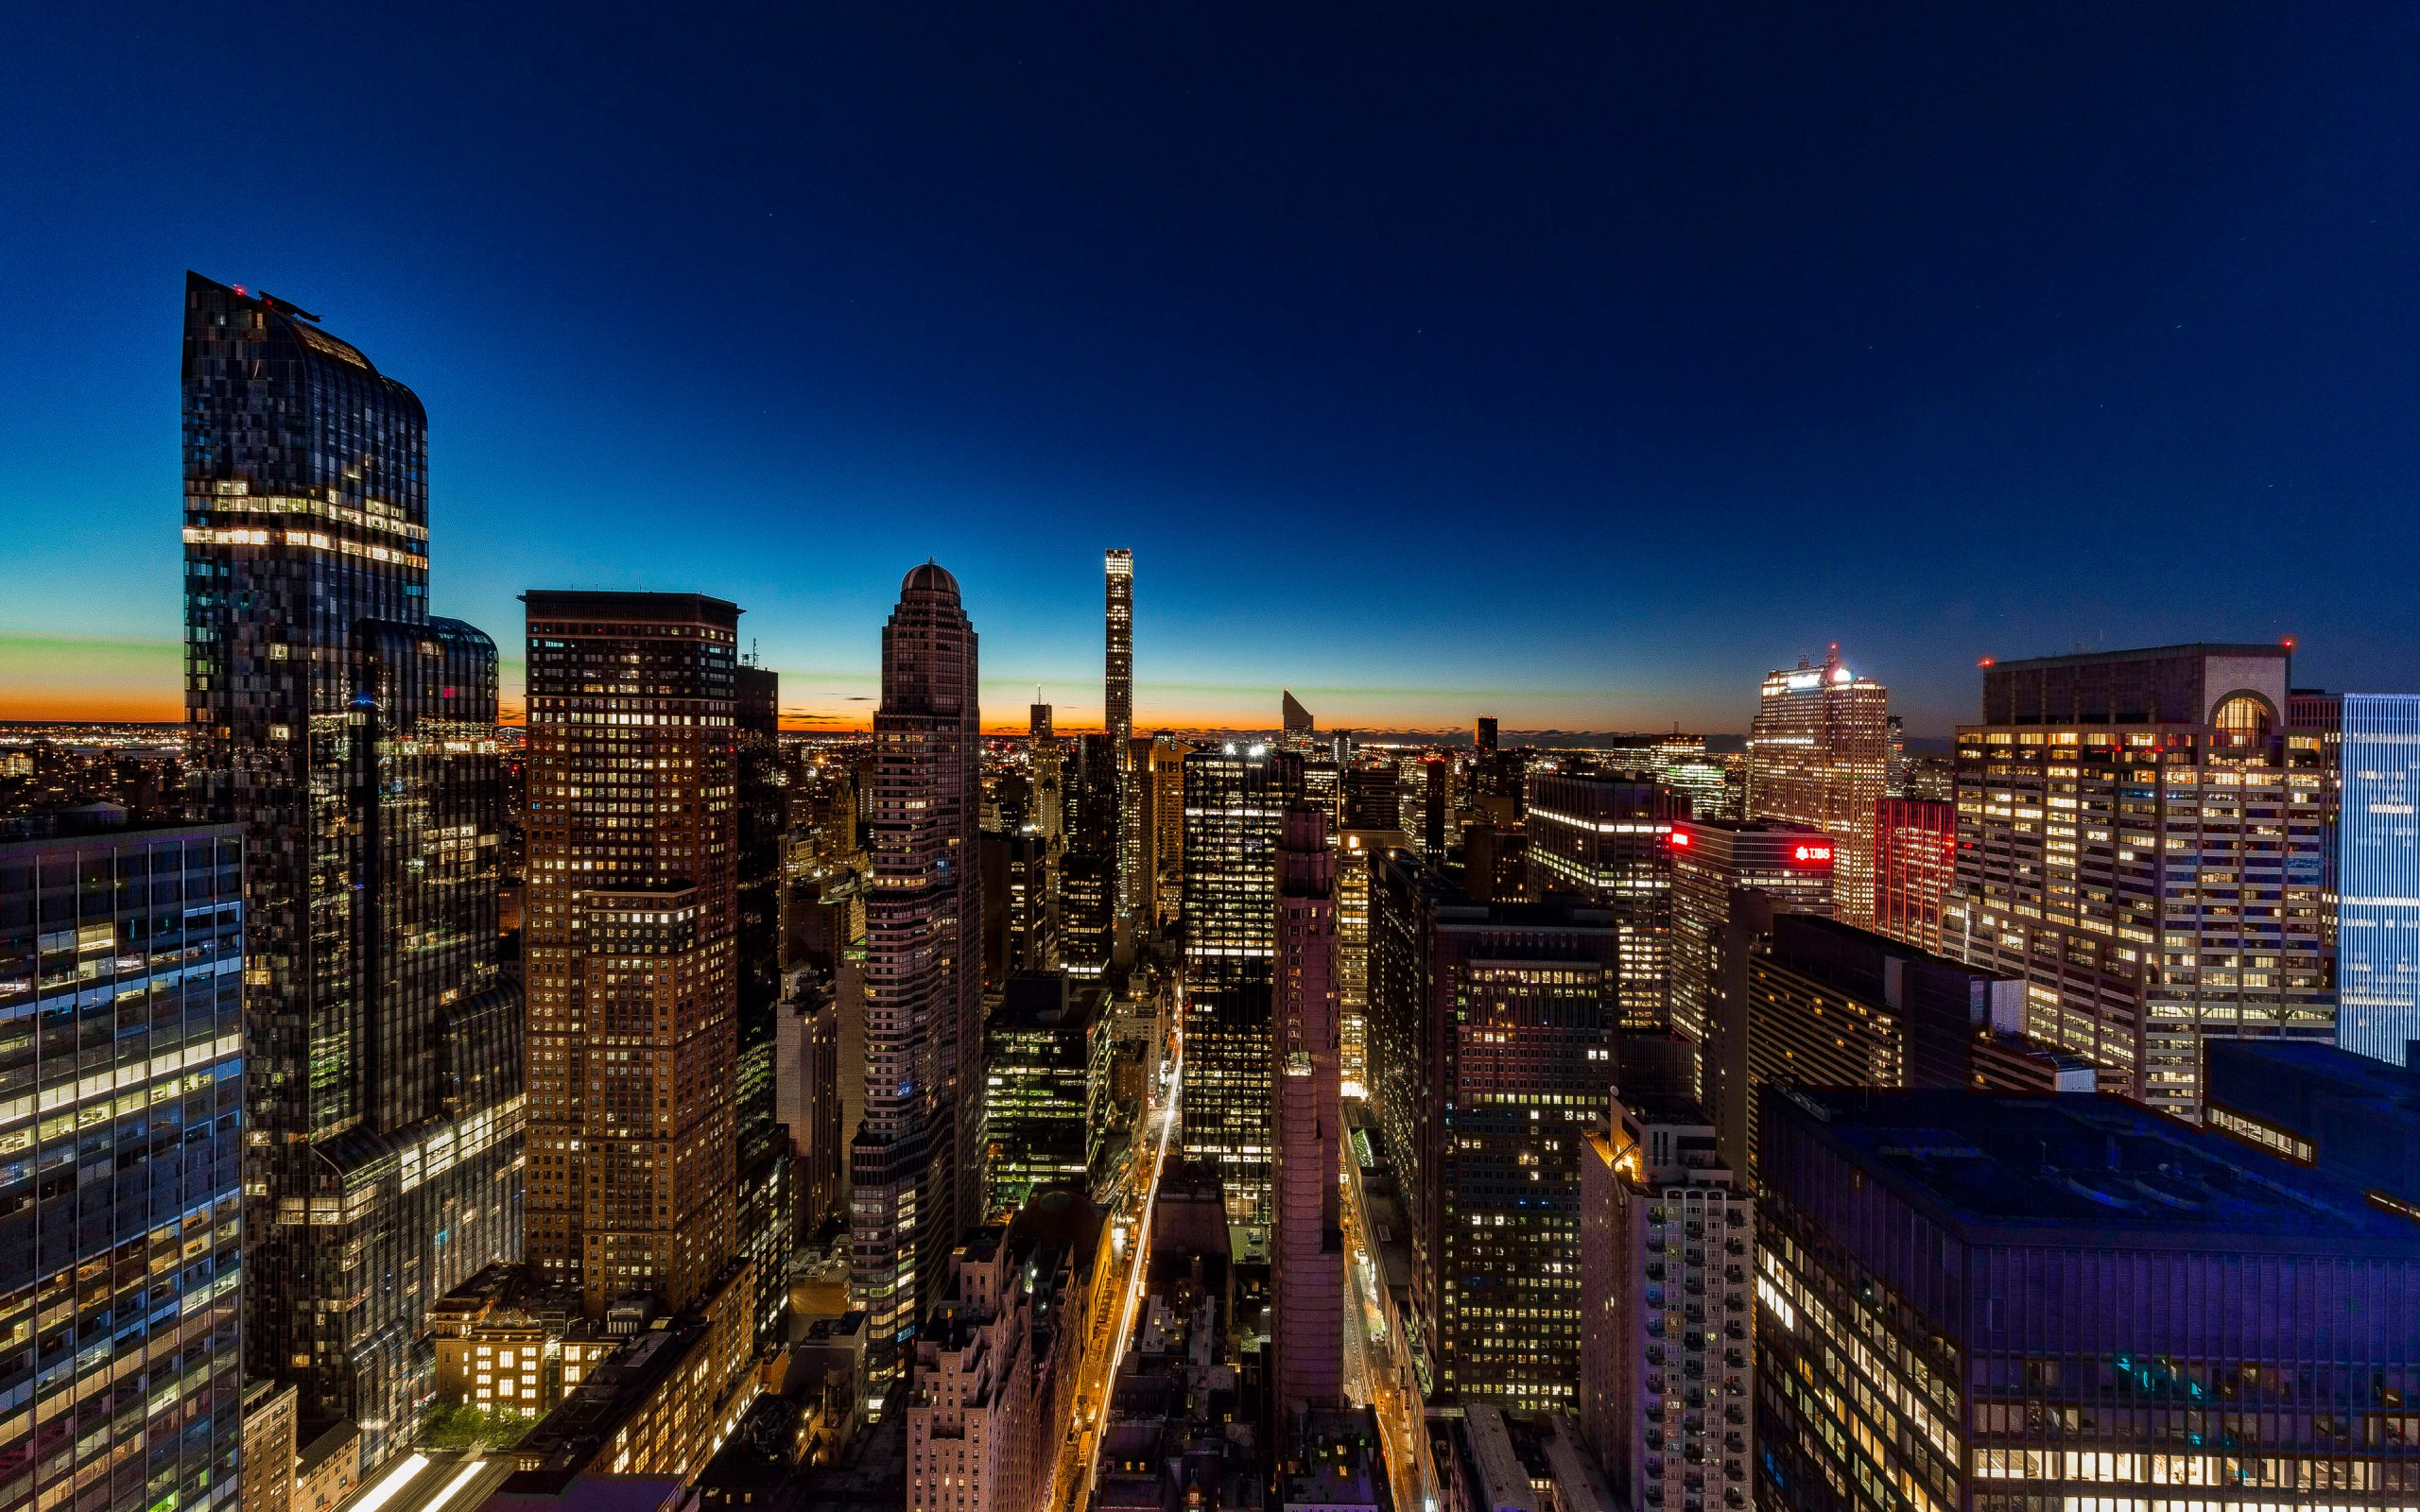 Night New York Image